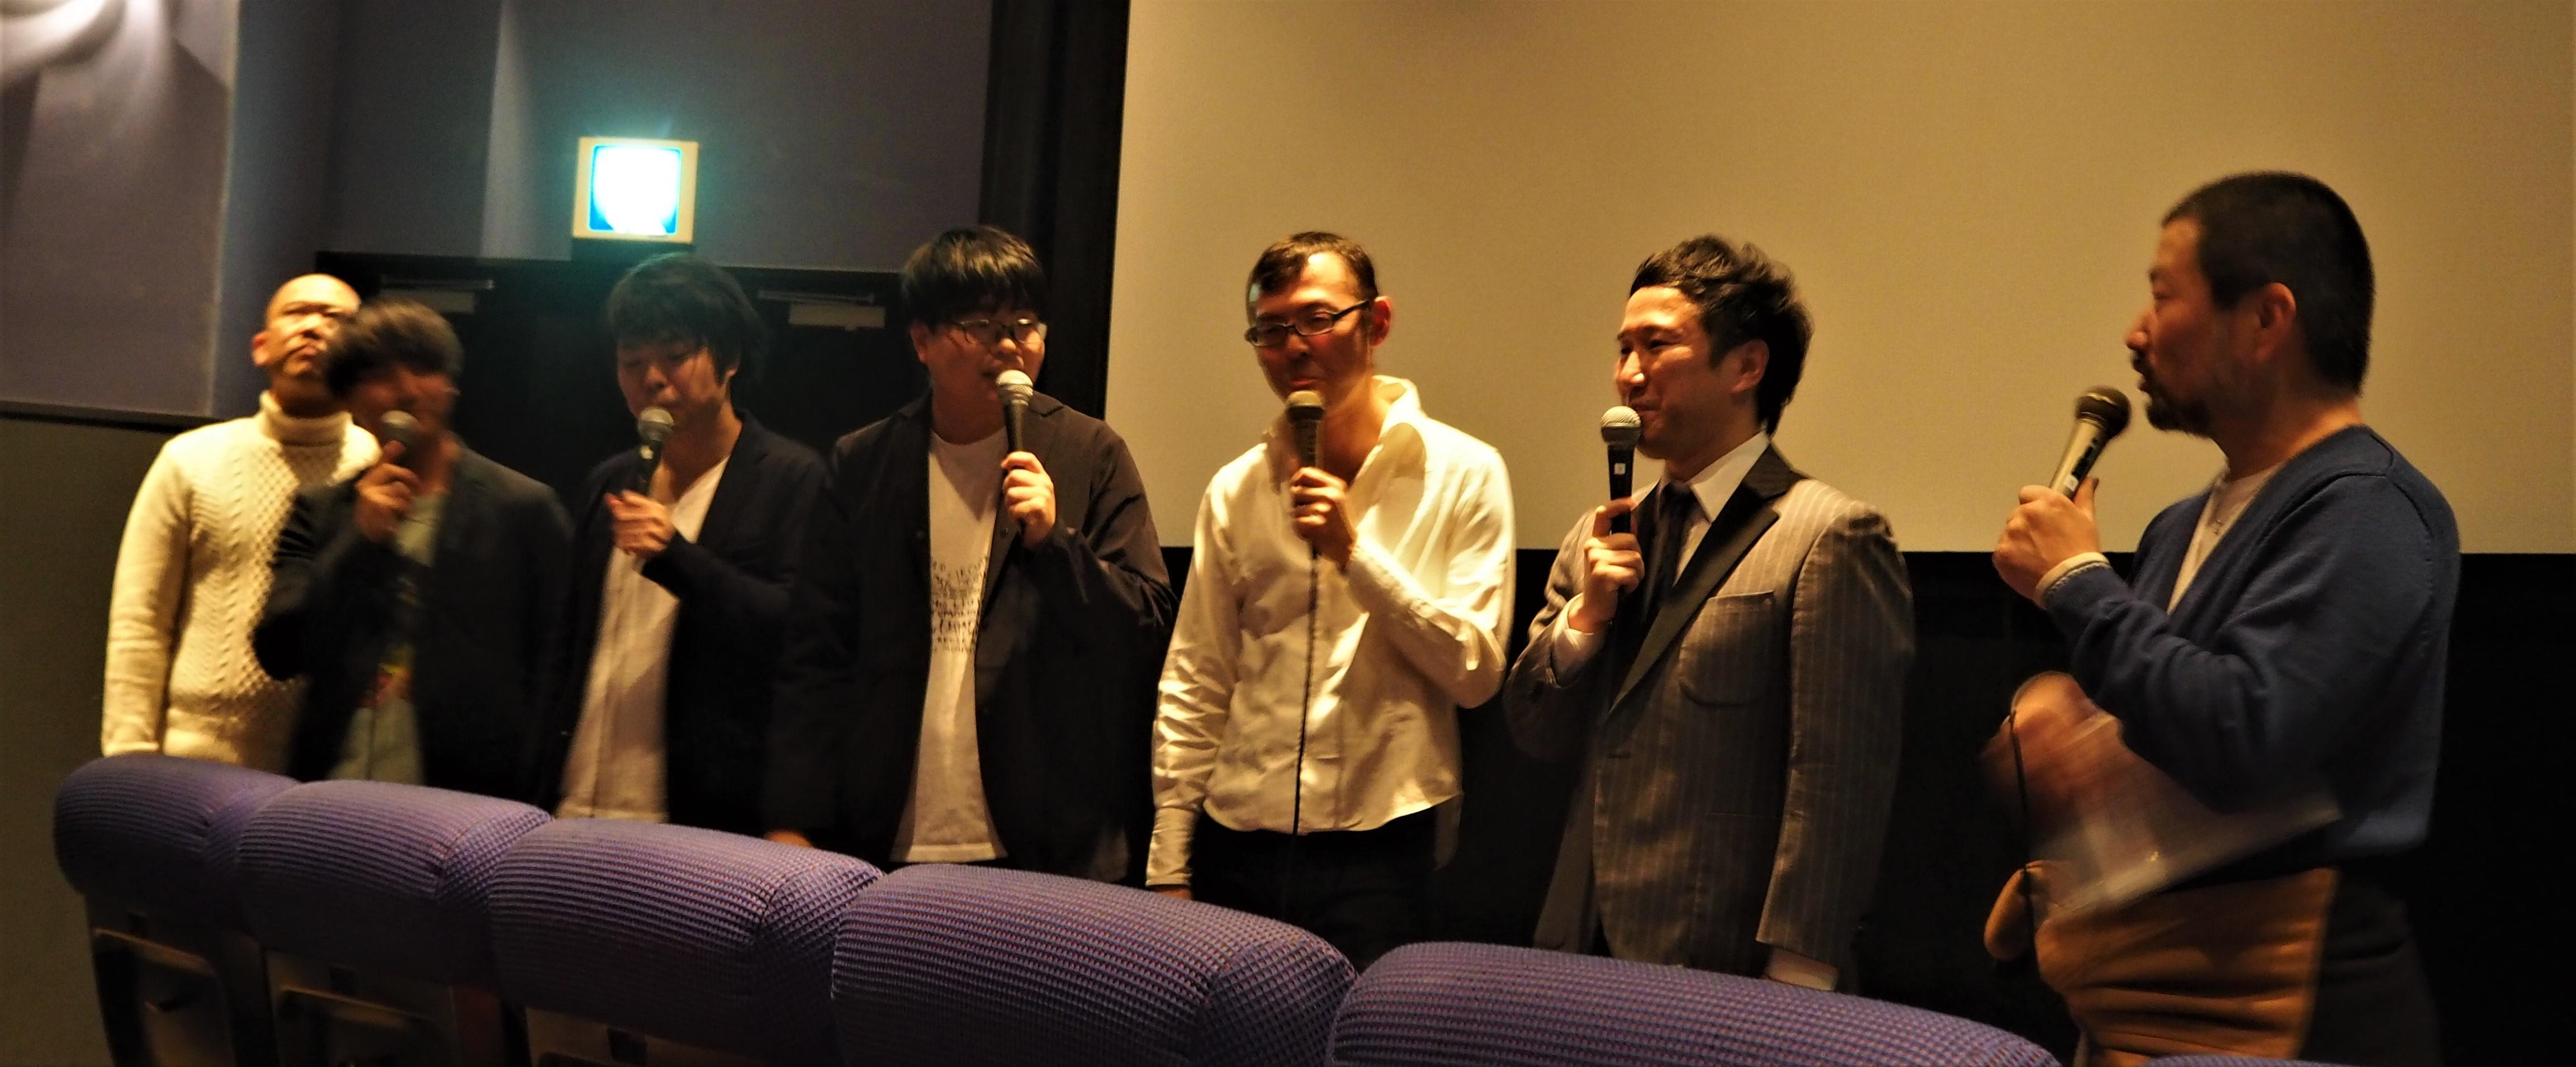 http://news.yoshimoto.co.jp/20180211221159-b937926c779520baa34433f2d5a1bcfb1e80b8c4.jpg